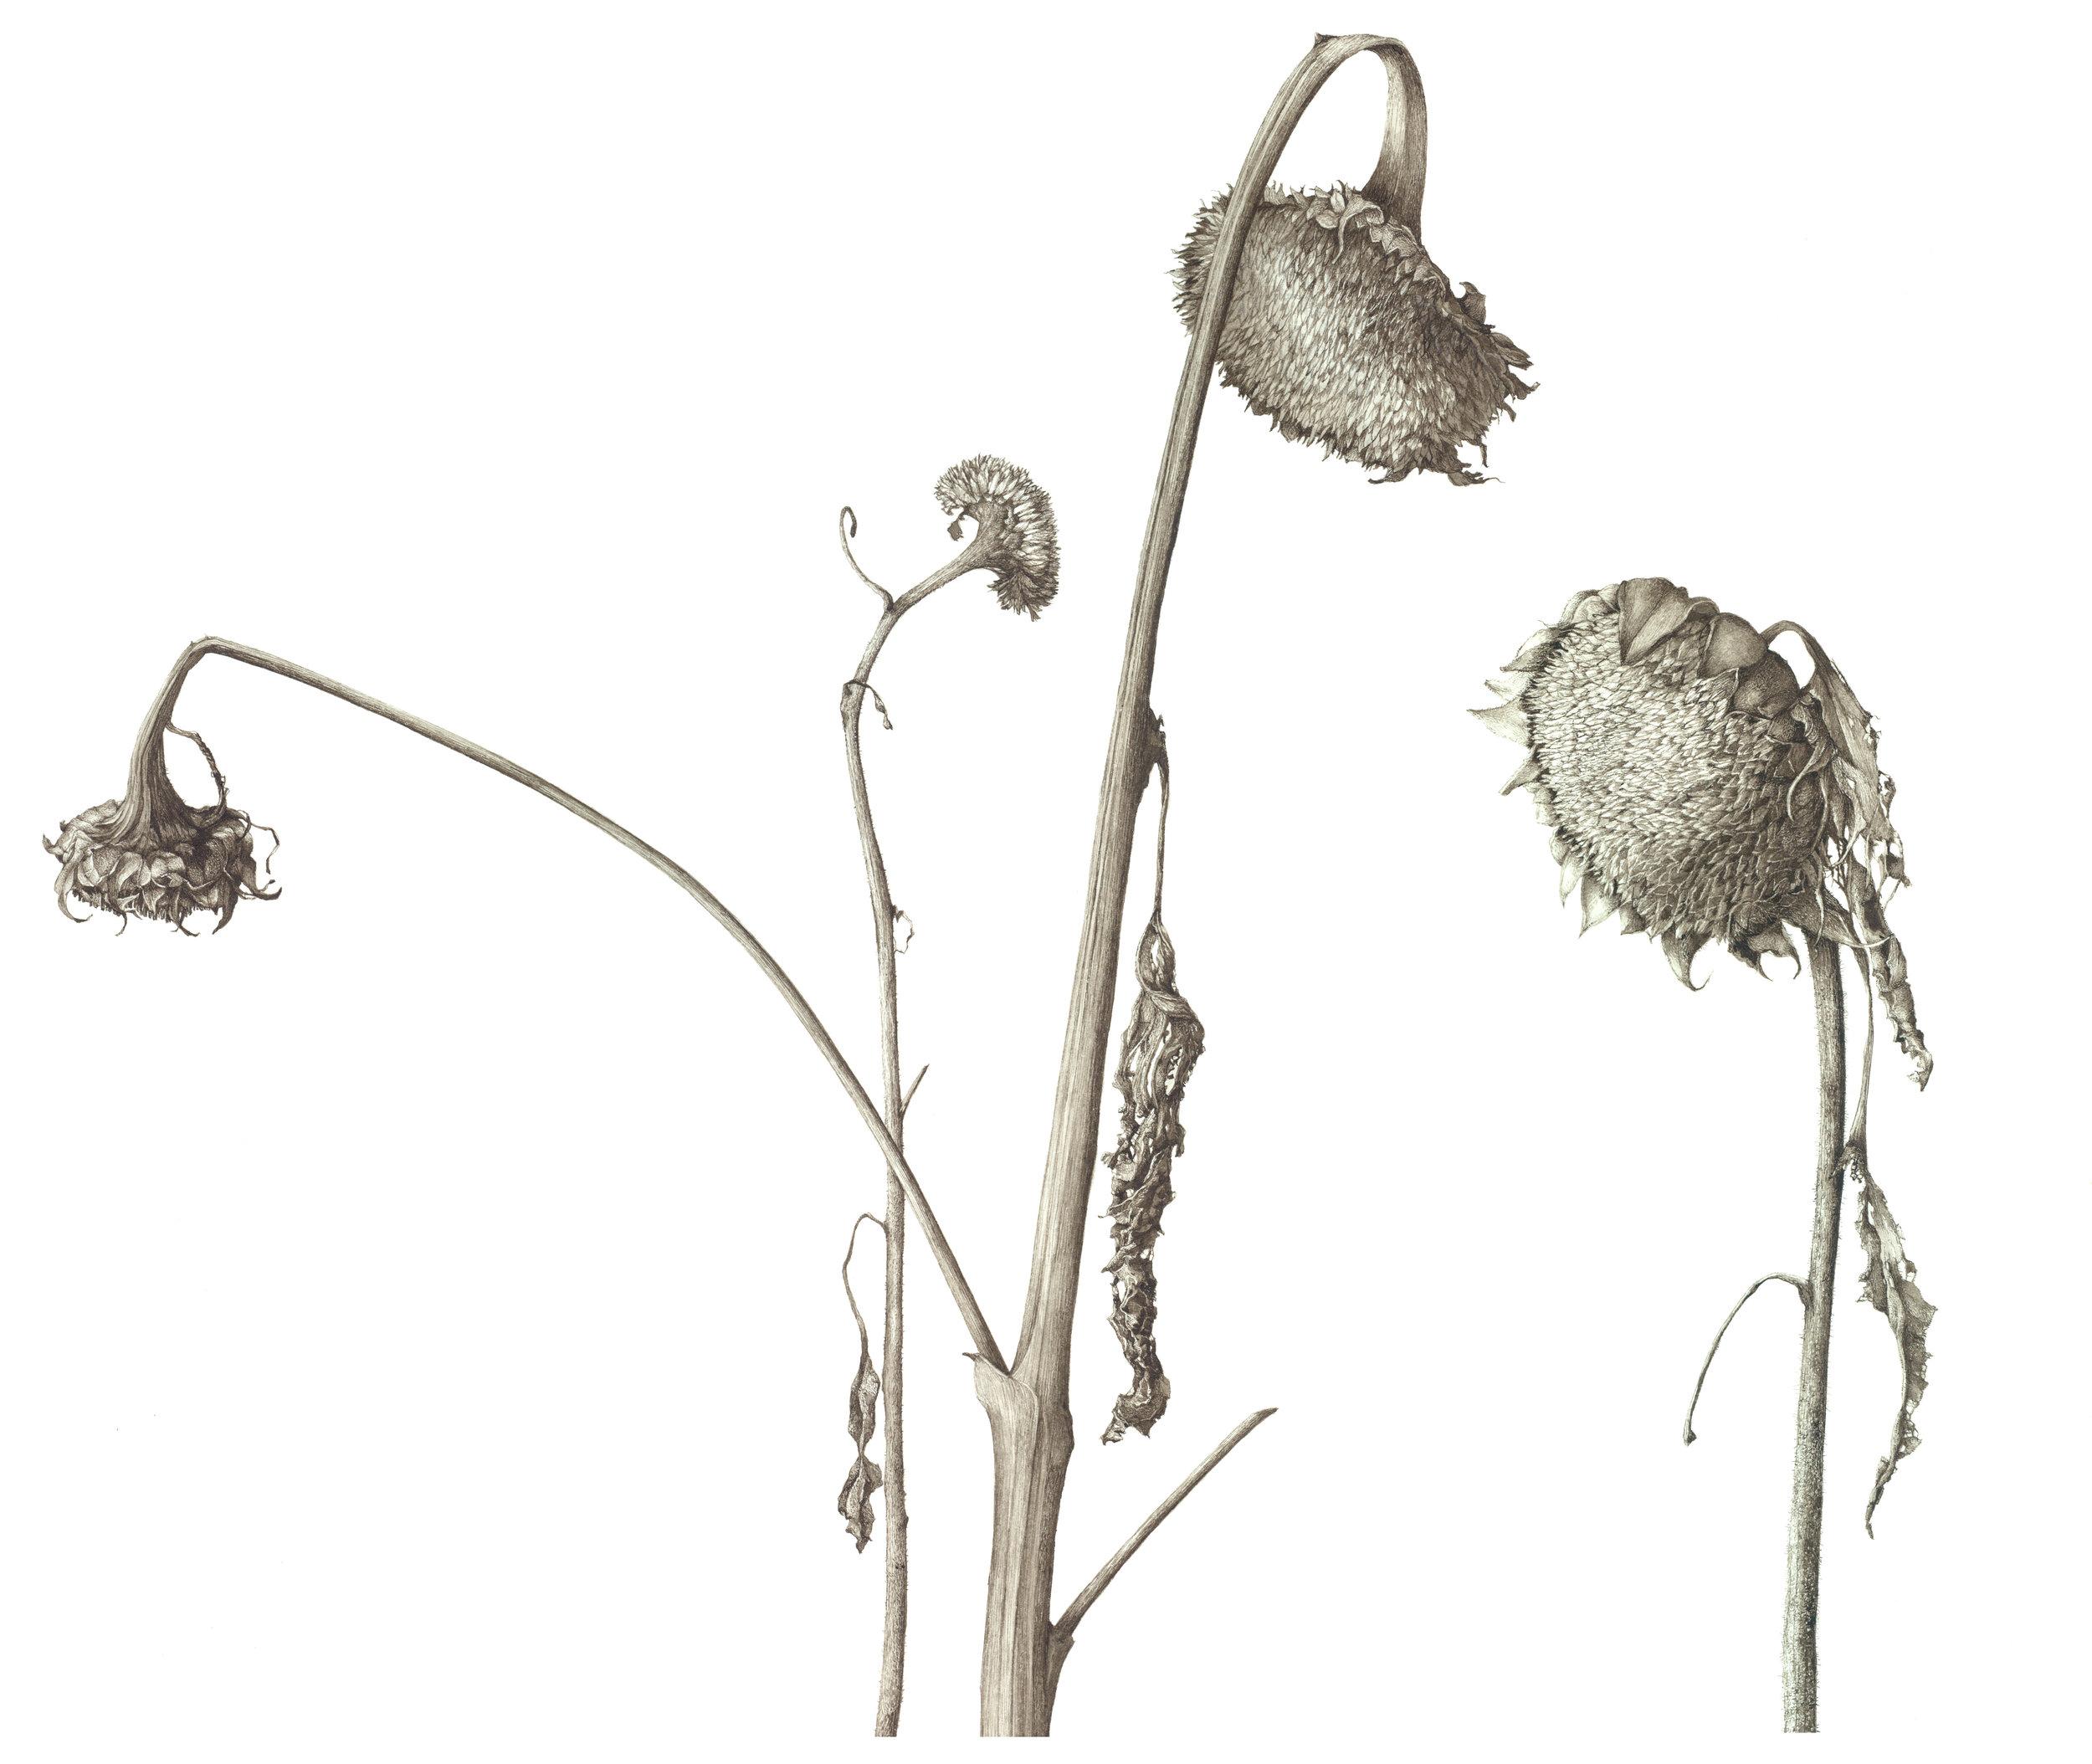 4.GastingerSunflowers.jpg